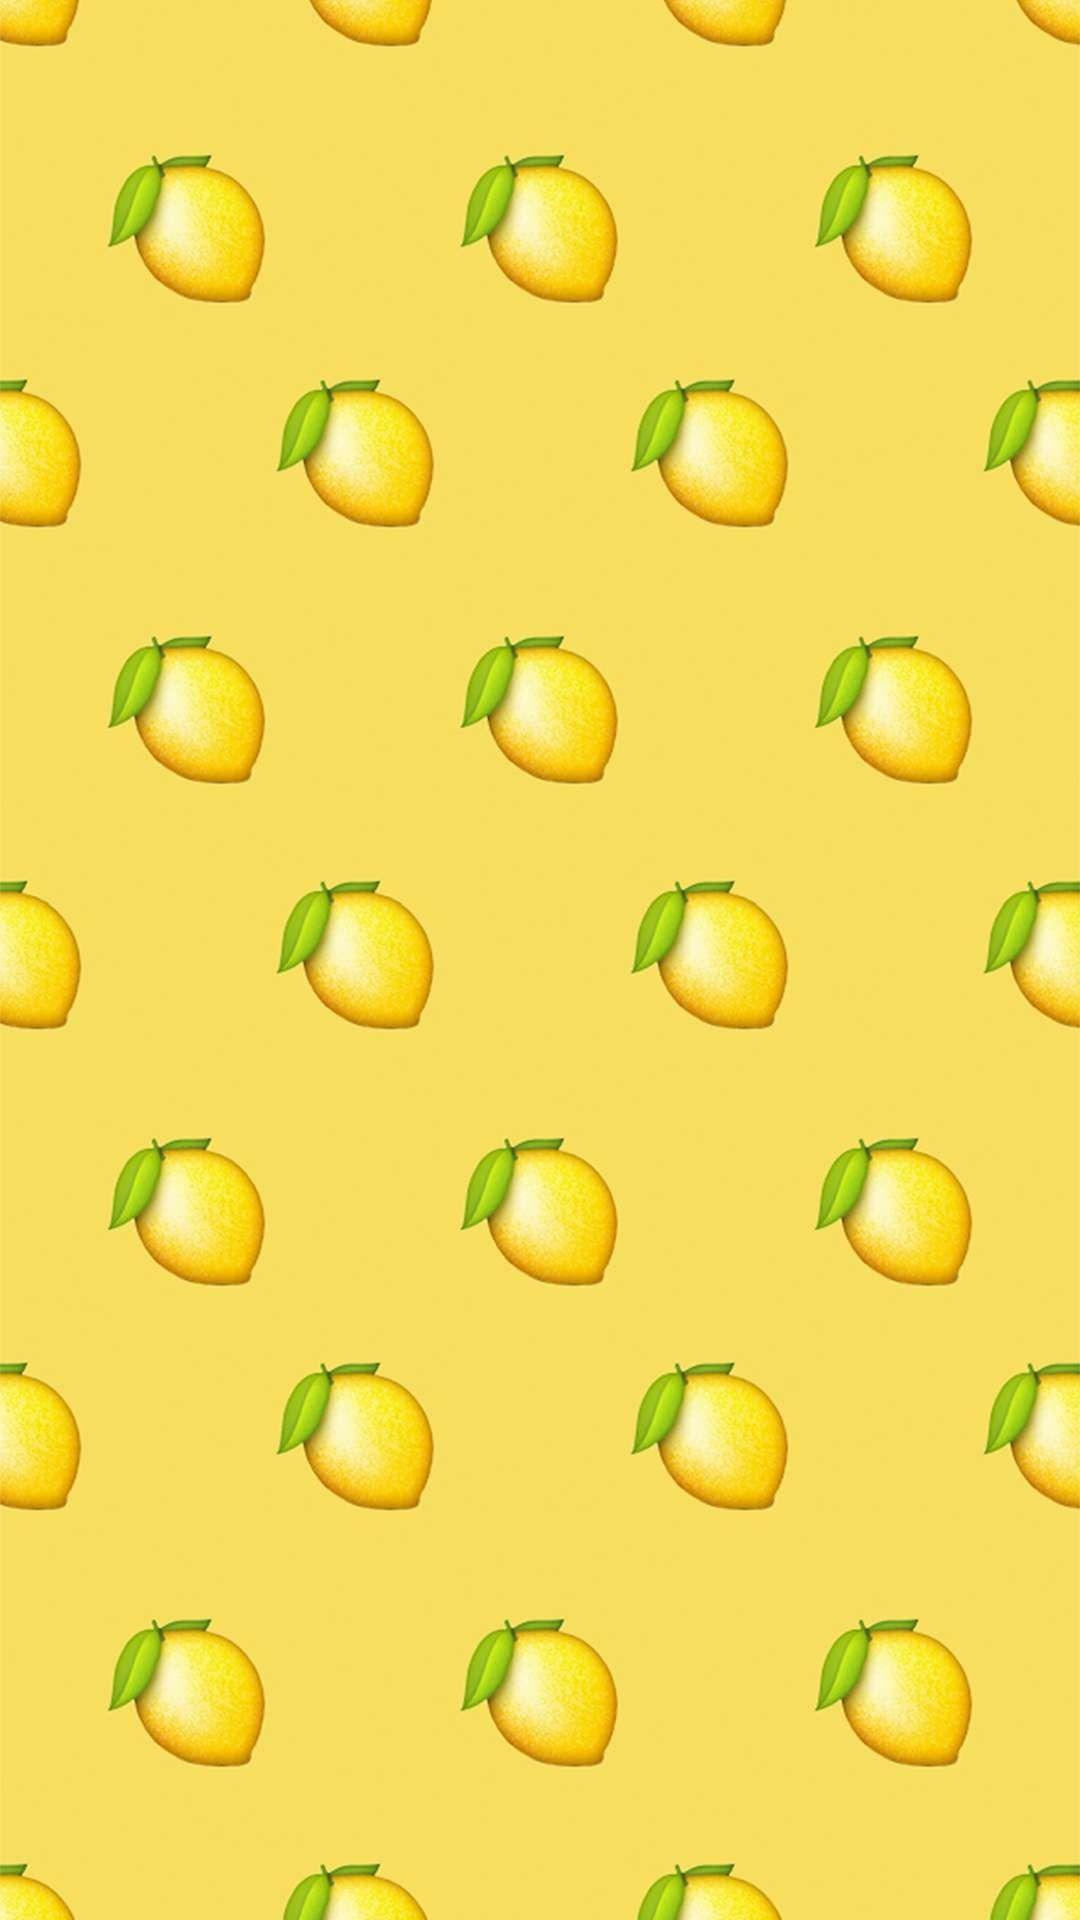 Pin by Samantha Keller on ..1 Cute emoji wallpaper